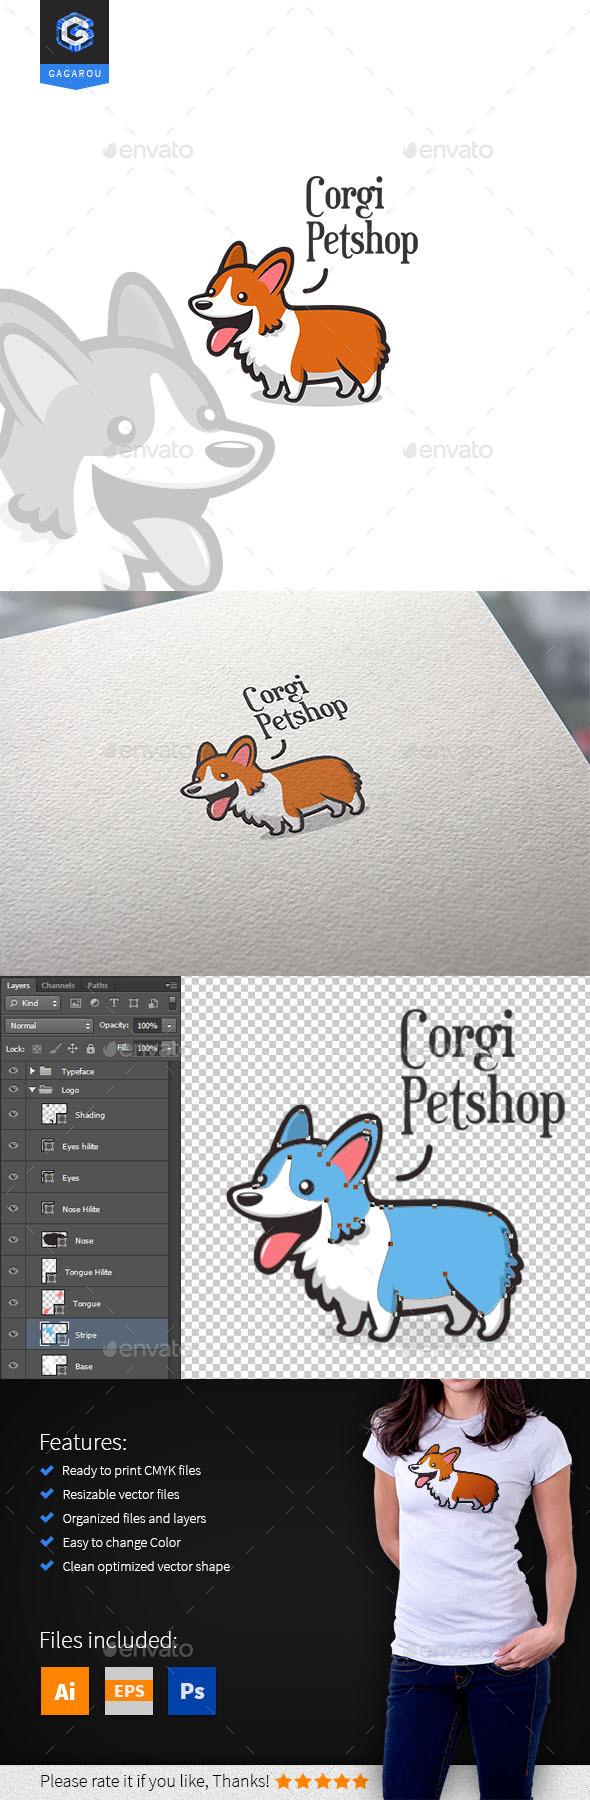 Corgi Petshop Logo